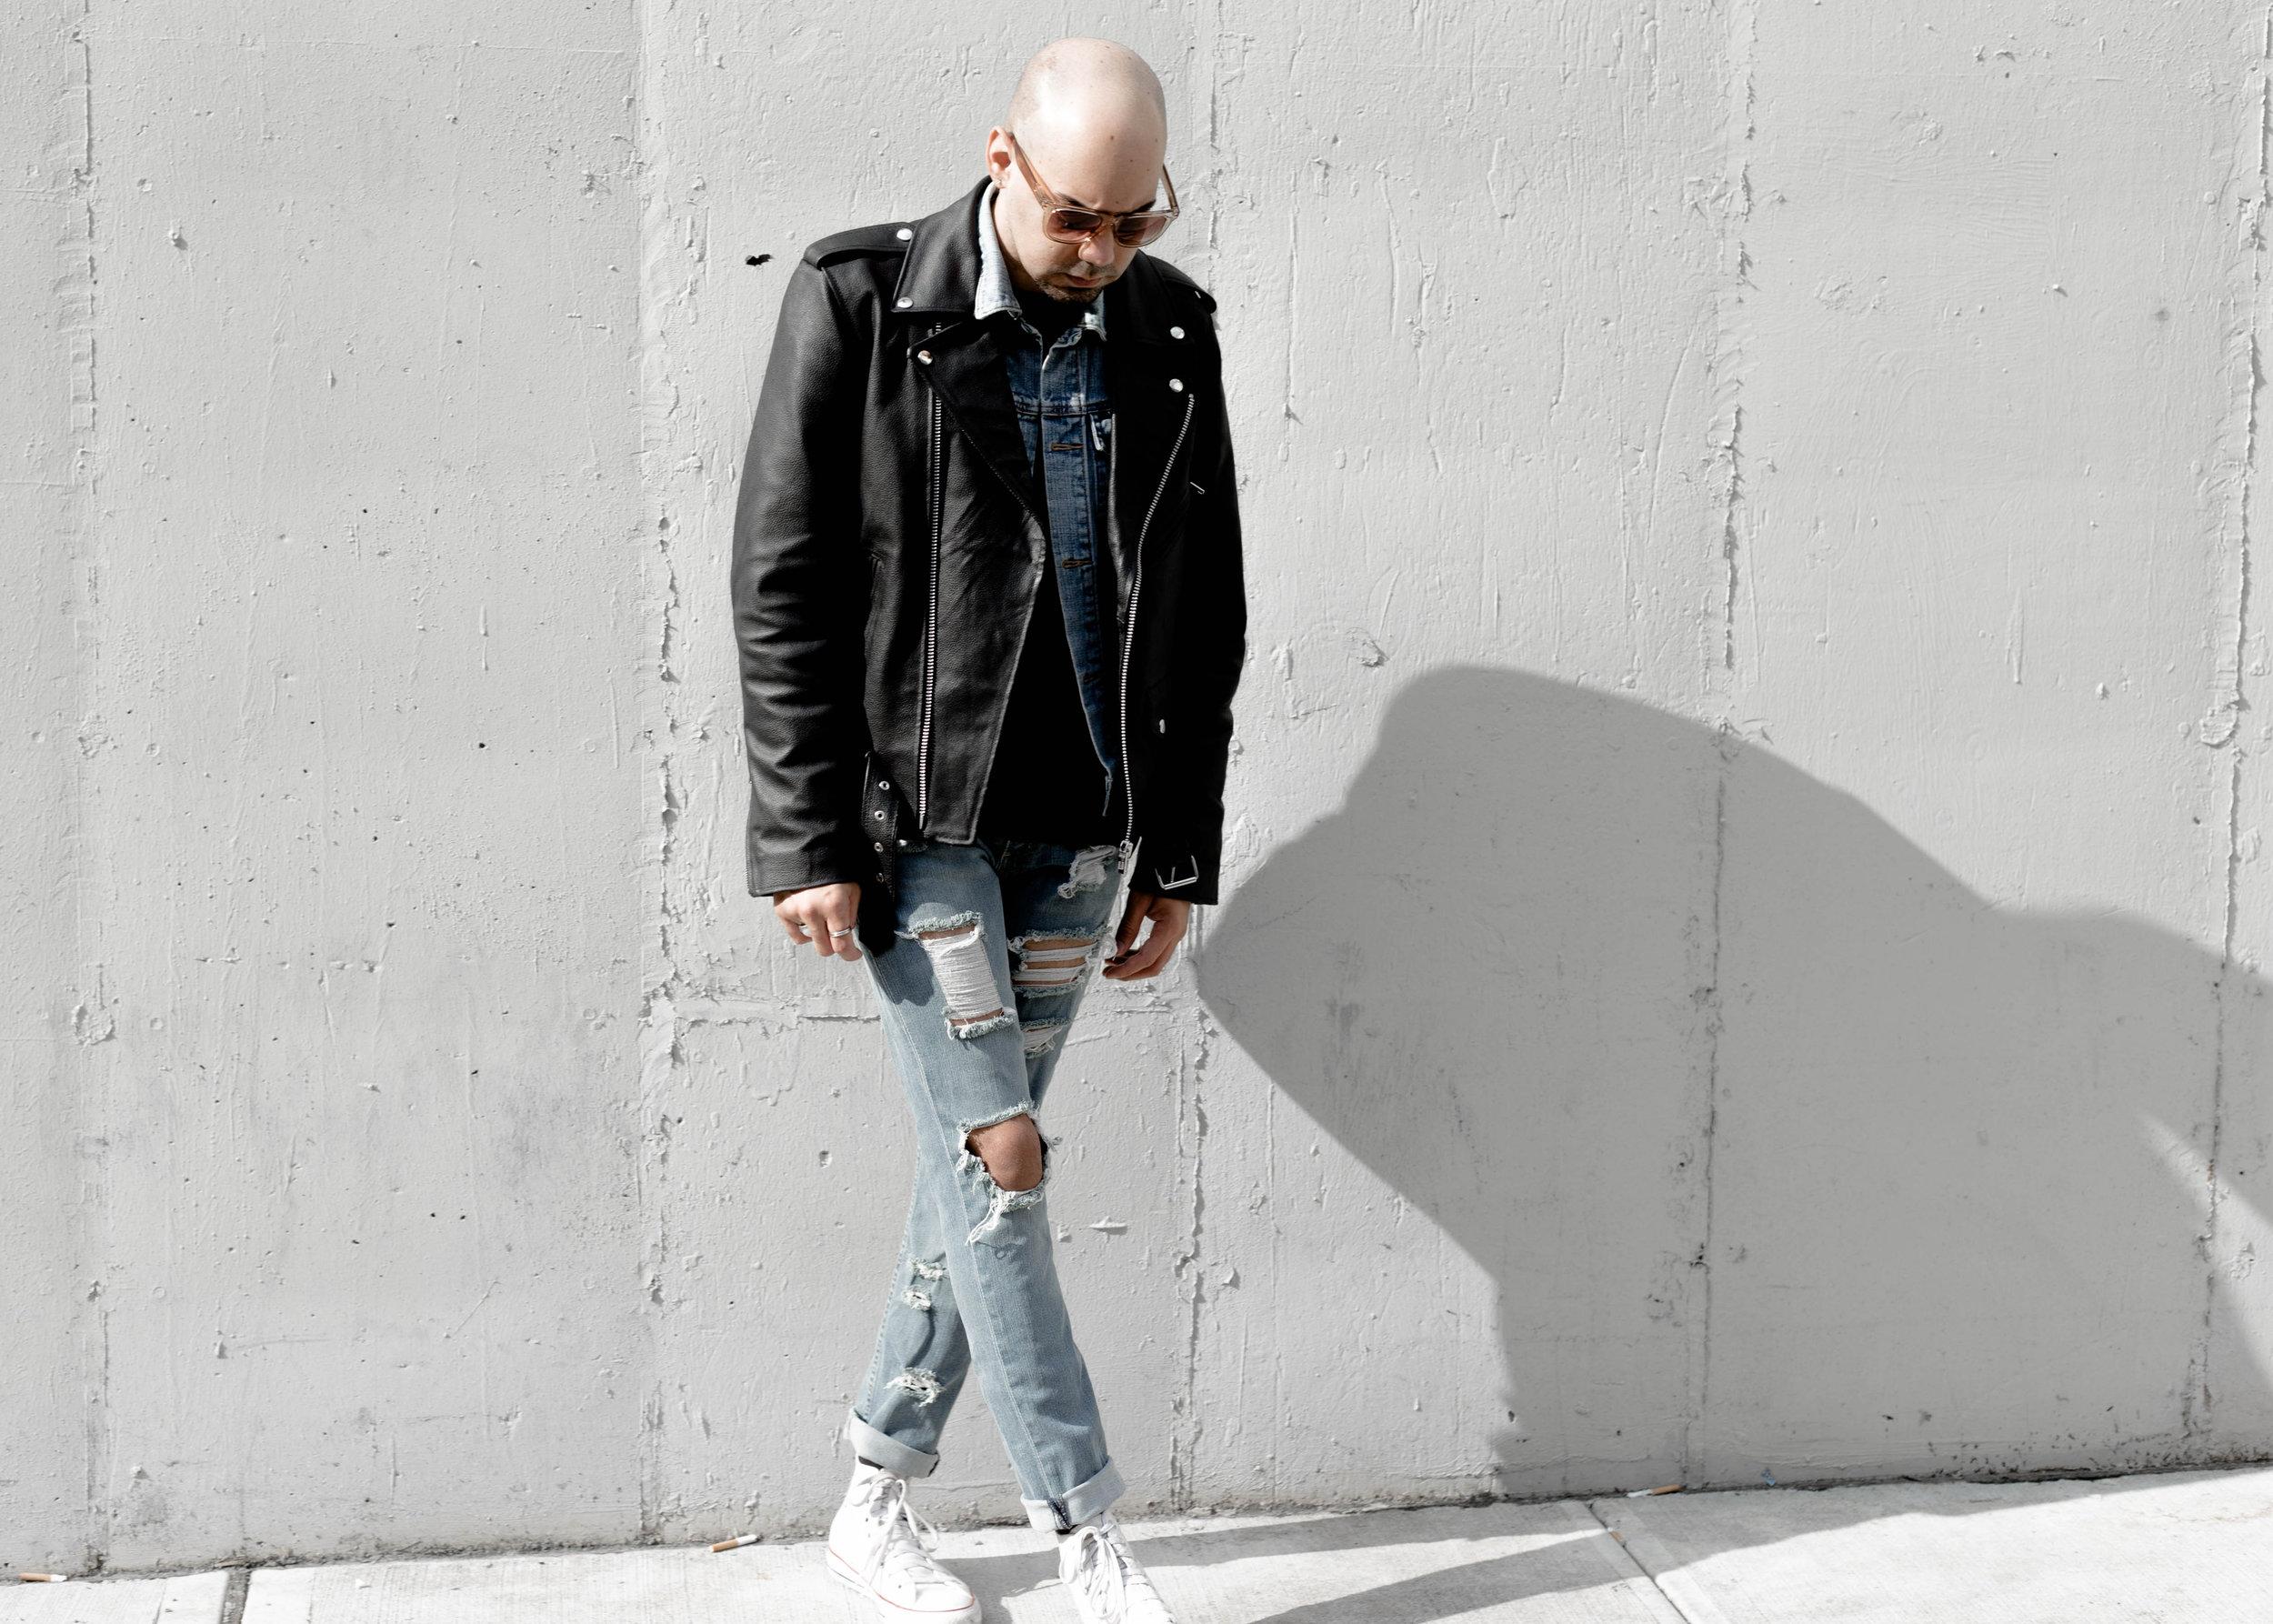 sam-c-perry-leather-jacket-denim-on-distressed-denim-full-walk.jpg